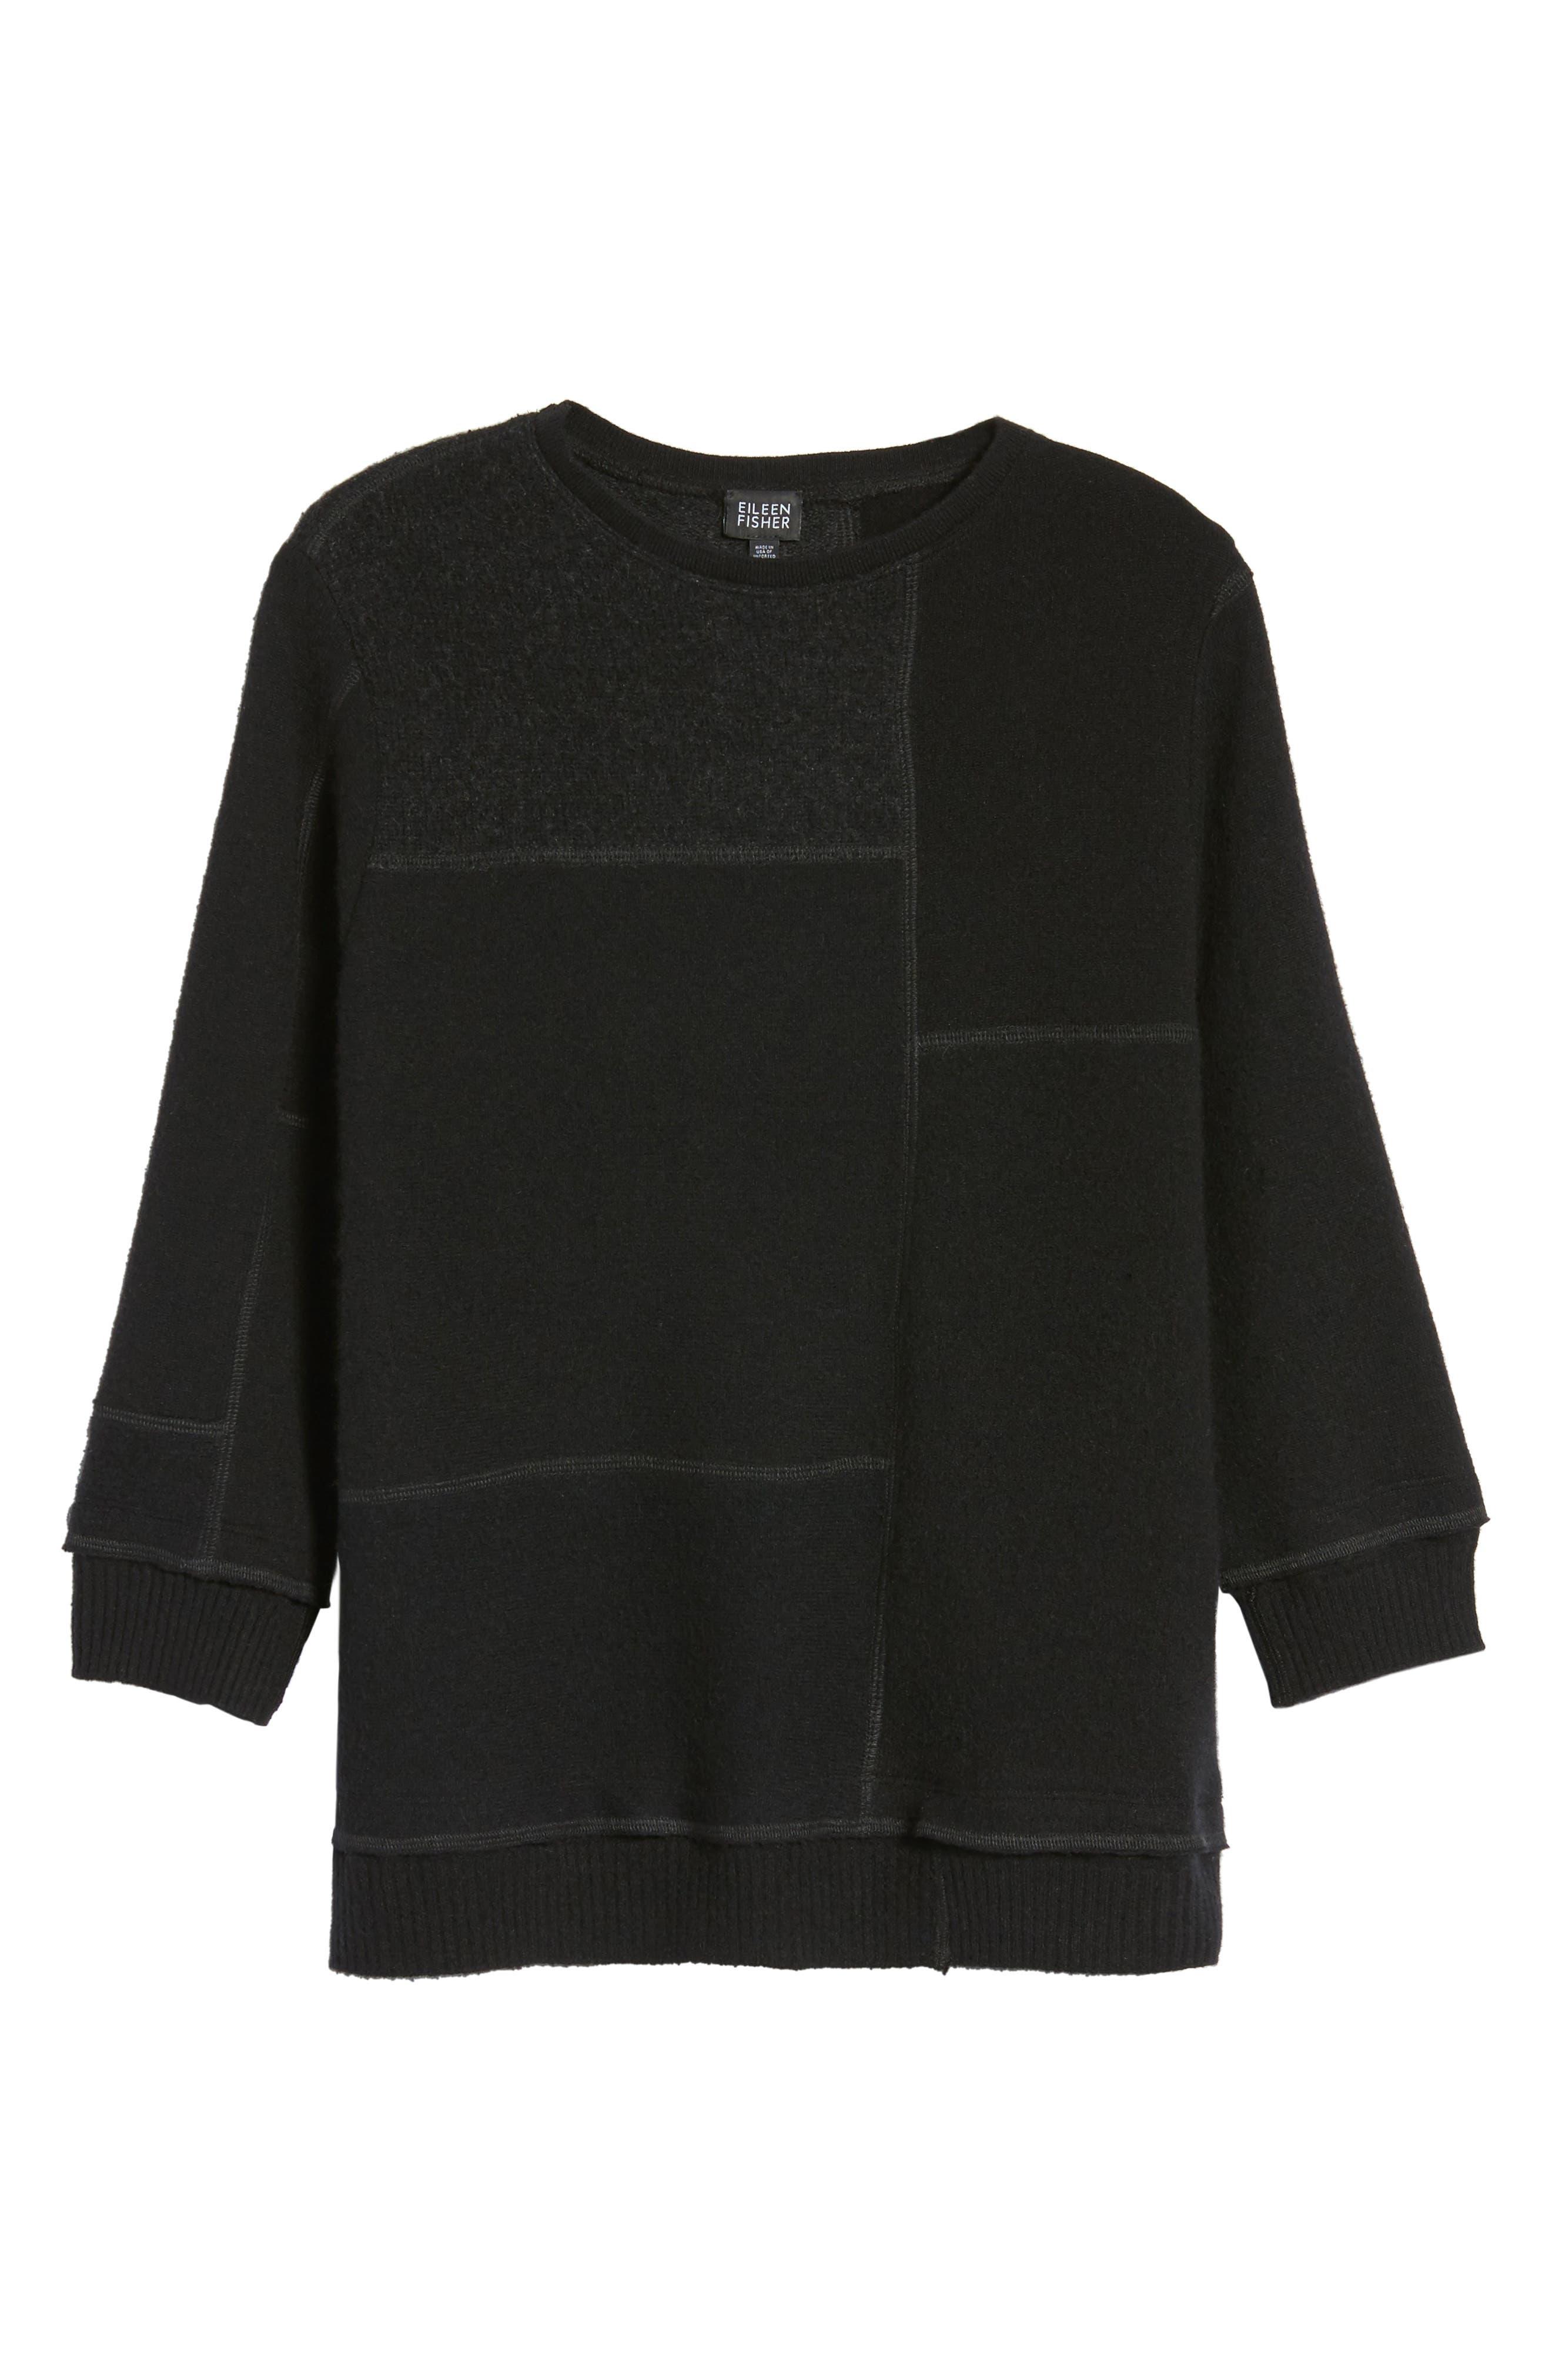 Colorblock Cashmere Sweater,                             Alternate thumbnail 6, color,                             001